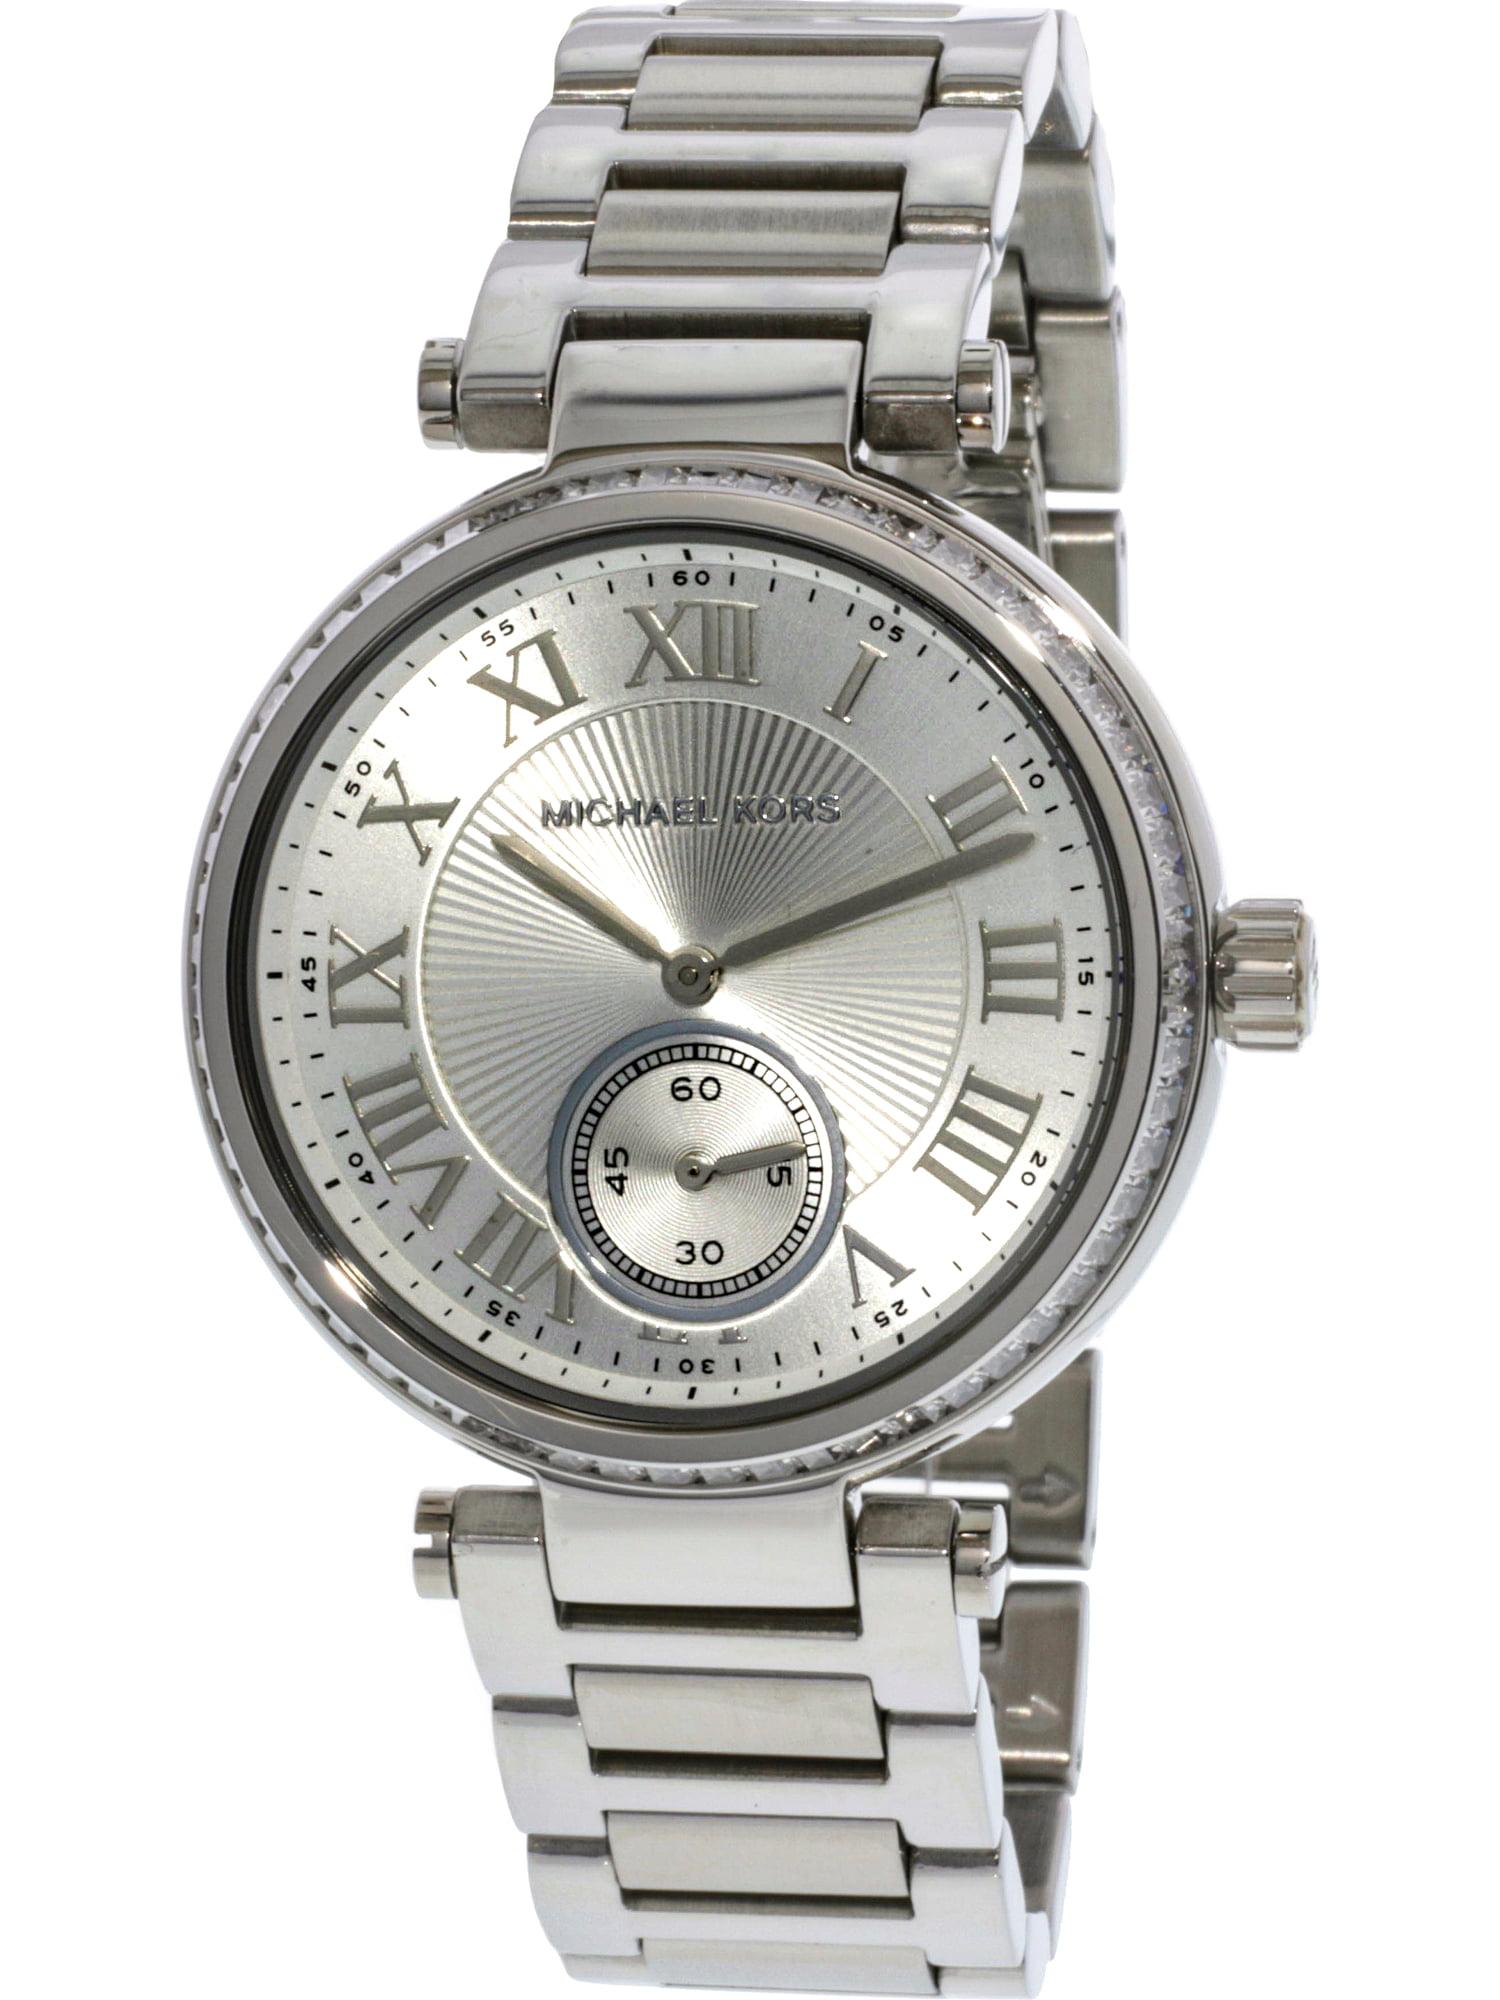 2d9a9c455442 Michael Kors - Women s Skylar MK5866 Silver Stainless-Steel Japanese Quartz  Fashion Watch - Walmart.com